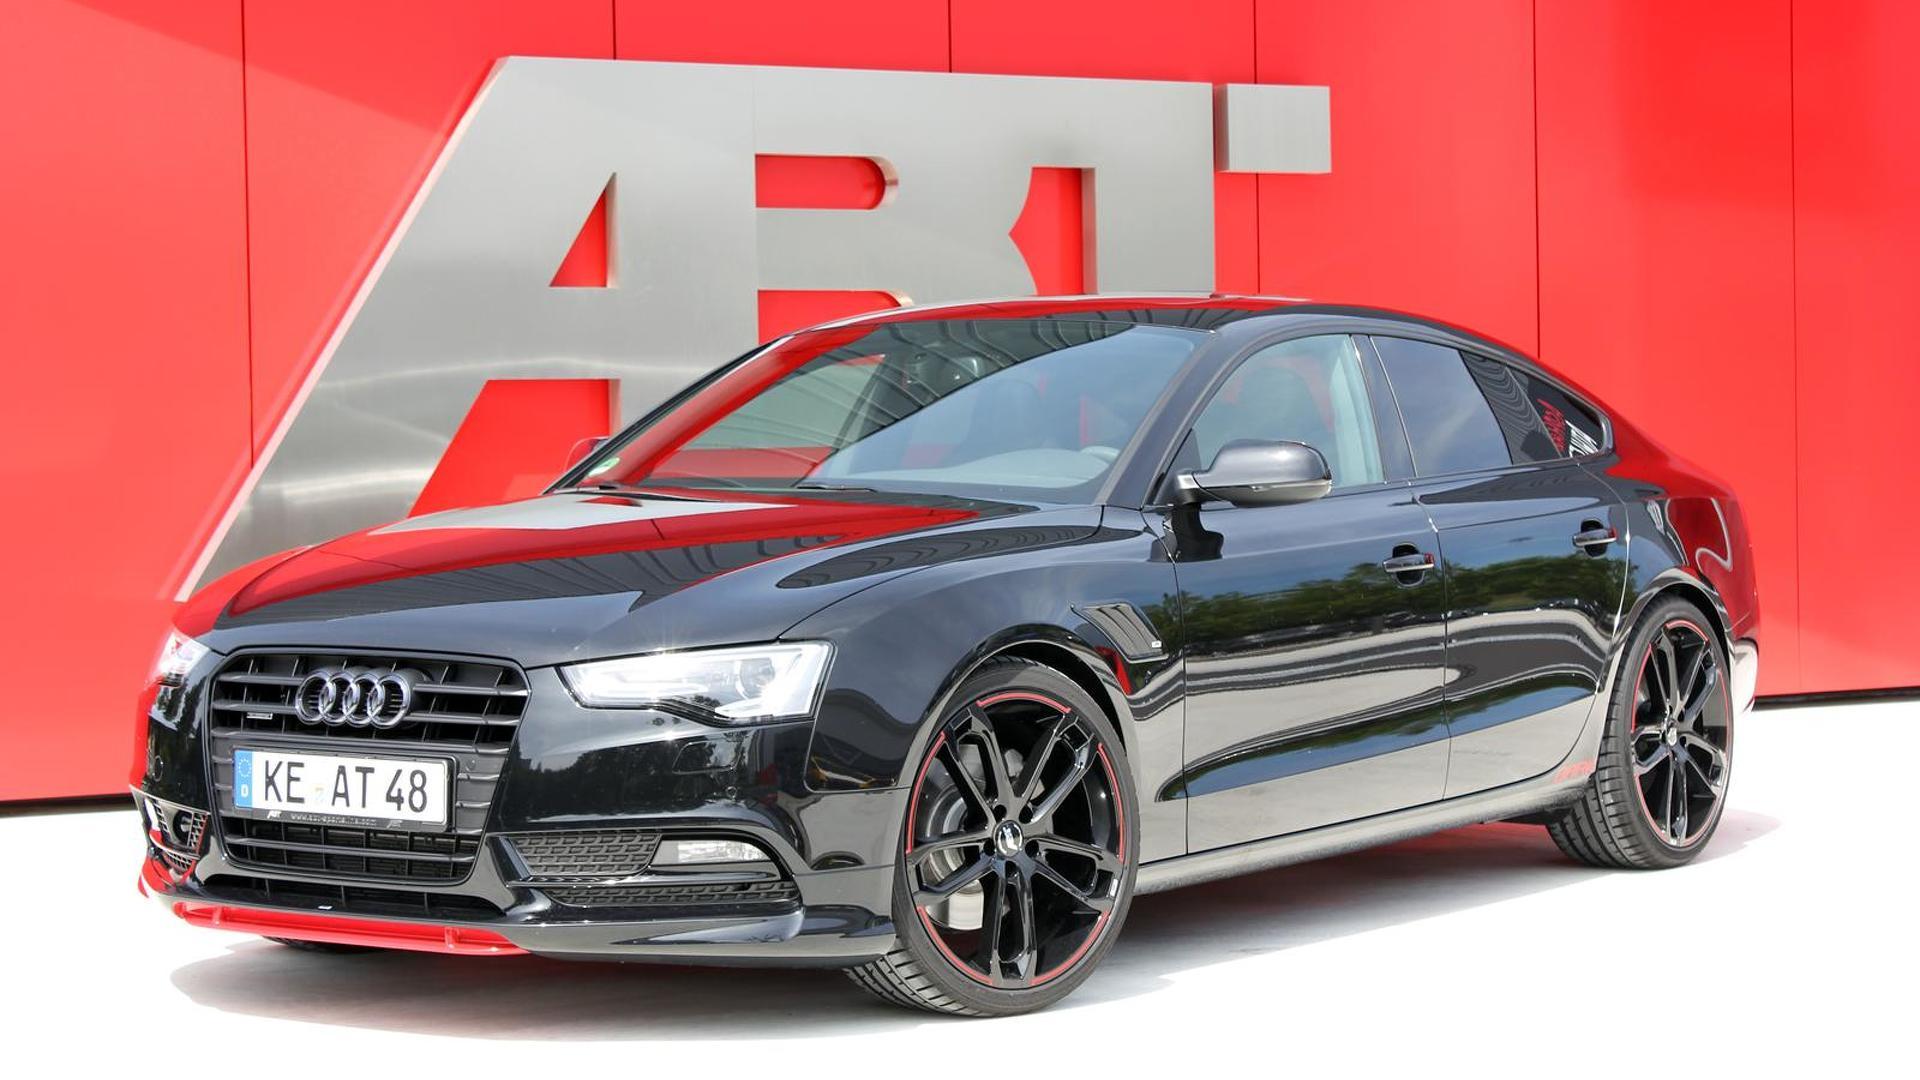 Тюнинг Audi AS5 DARK от ABT Sportsline